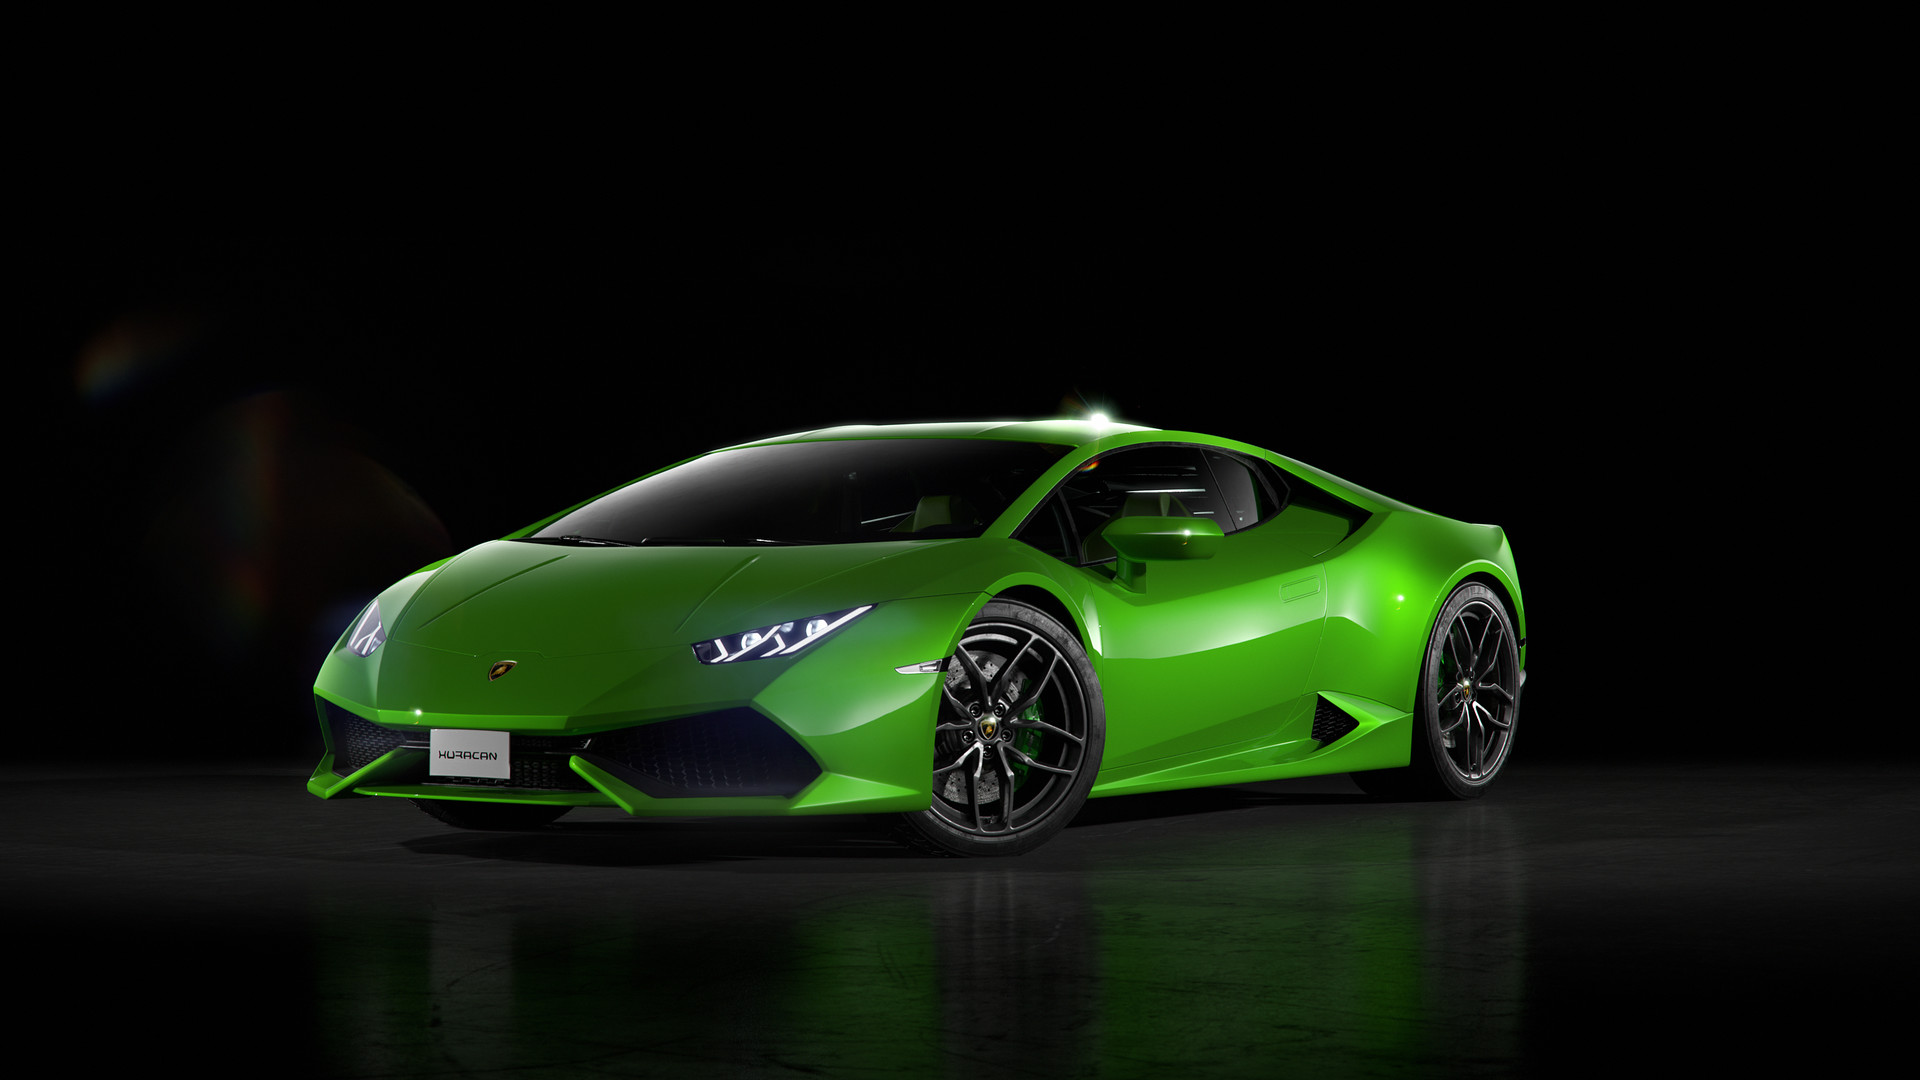 Wallpapers Green And Lamborghini On Pinterest: Green Lamborghini Huracan Front, HD Cars, 4k Wallpapers